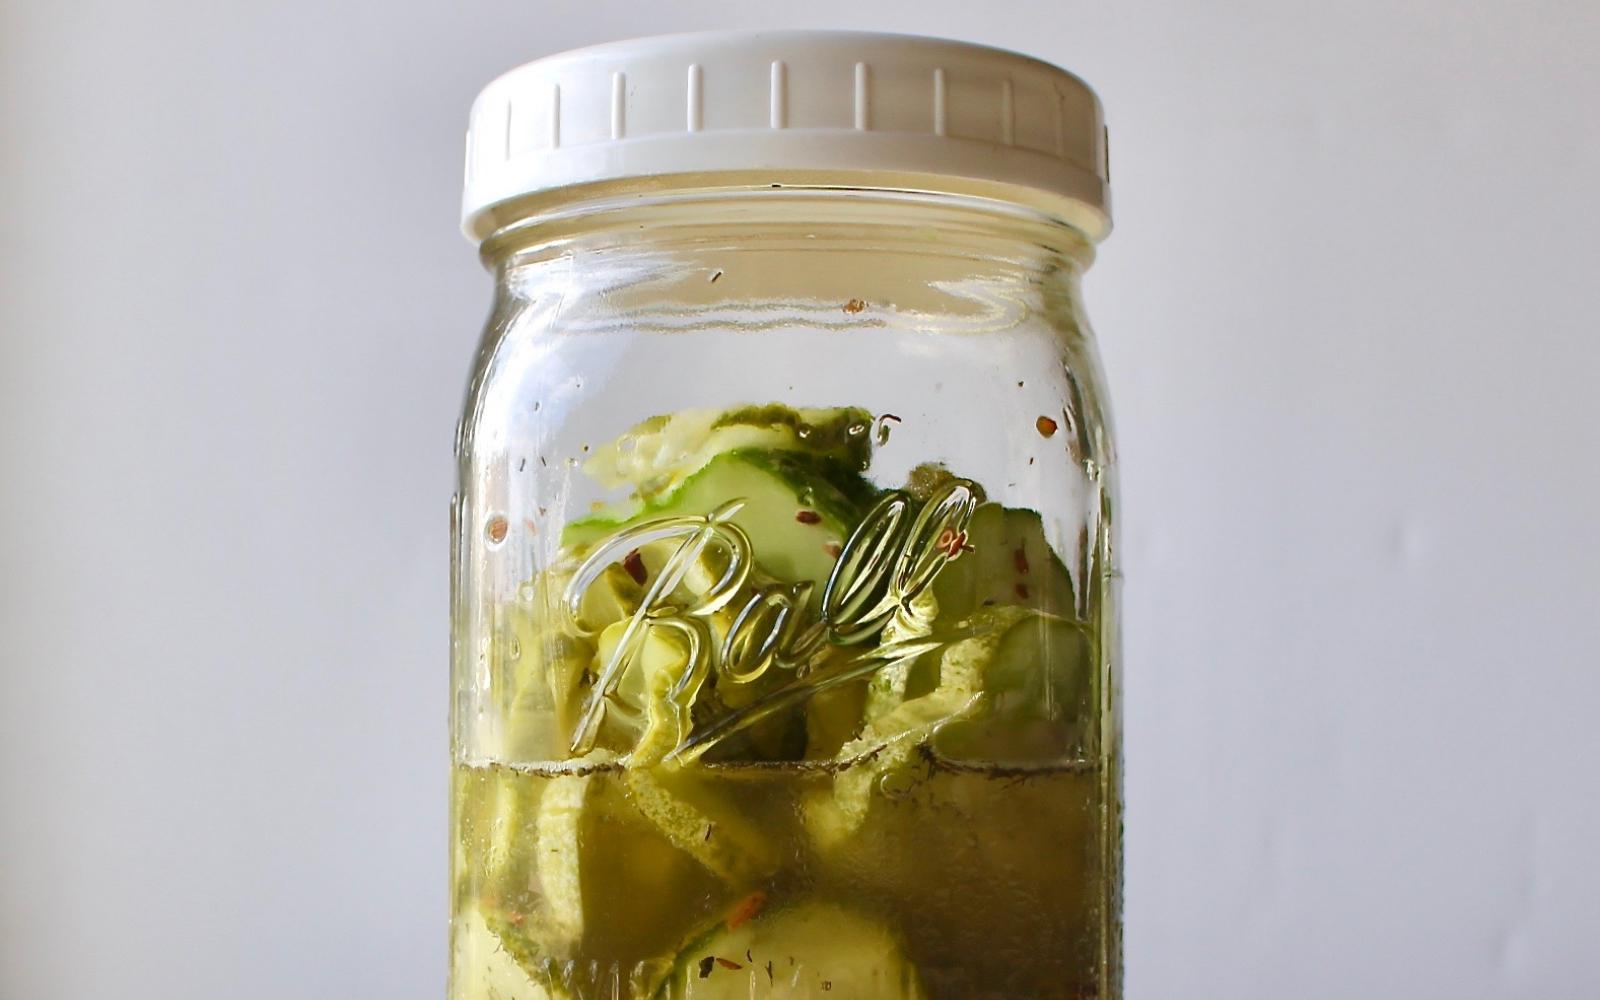 Crispy Flavorful Pickles